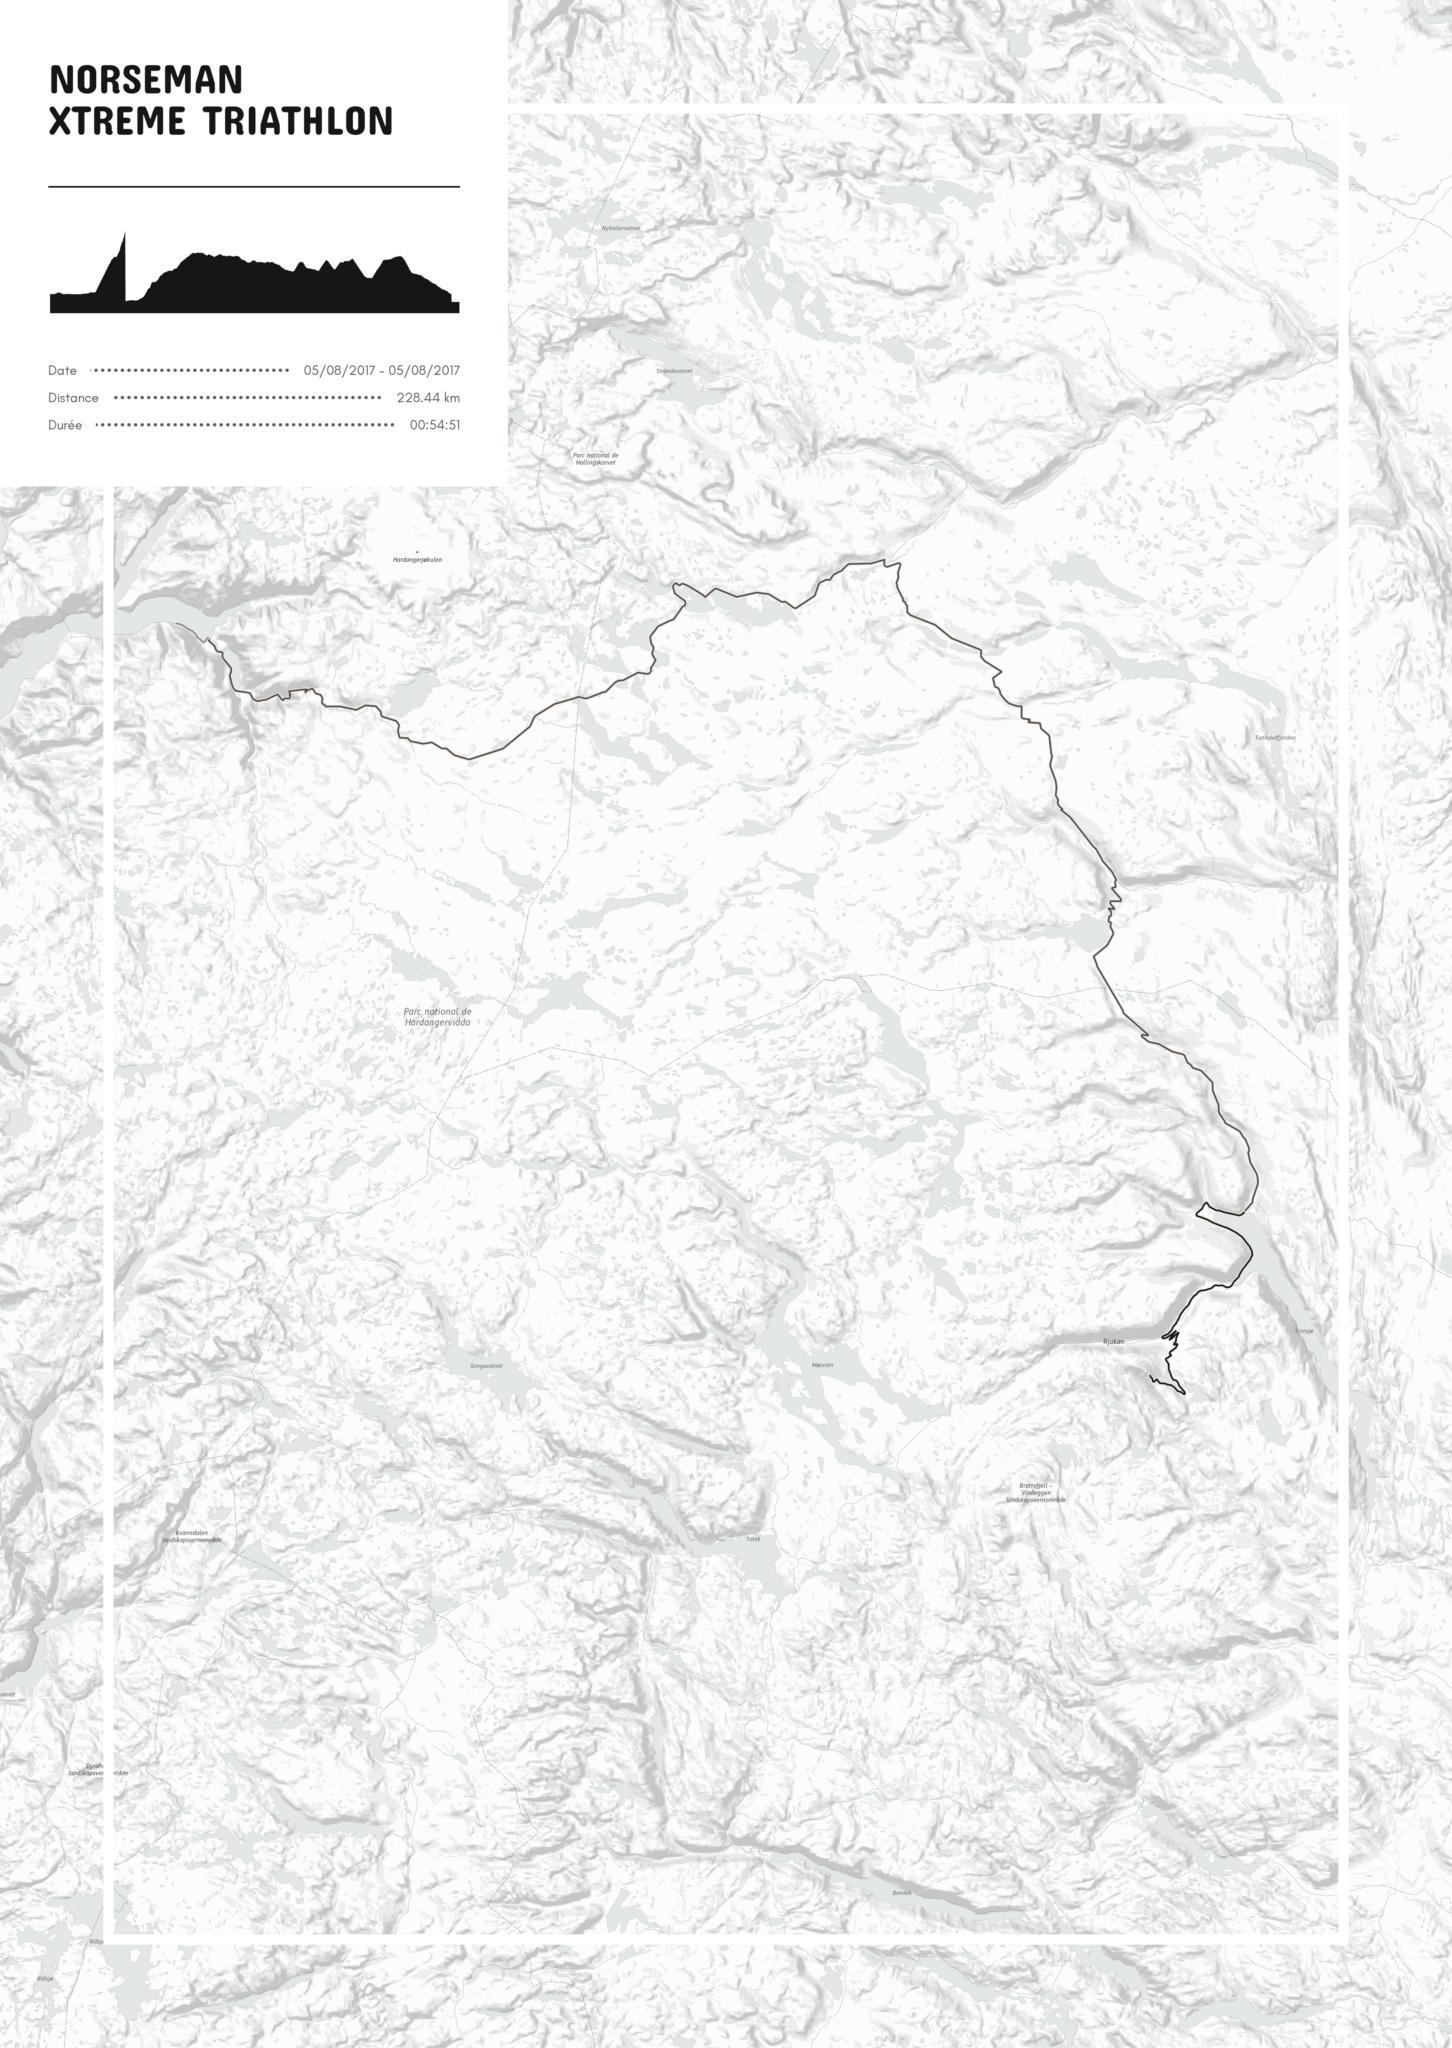 poster-Norseman  Xtreme Triathlon